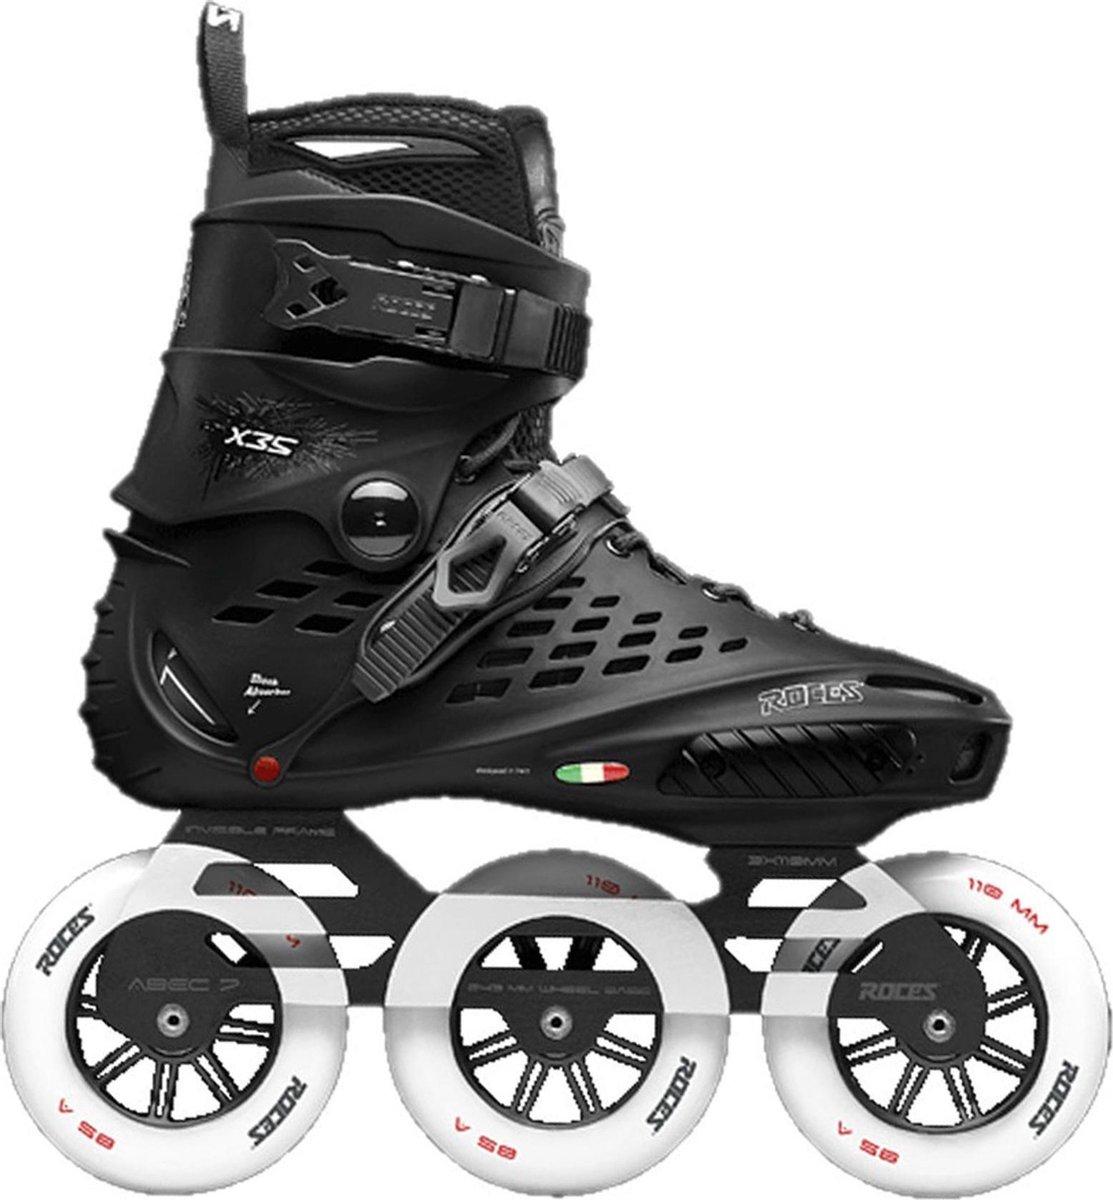 Roces X35 3x110 TIF Inline Skate Inlineskates - Maat 42 - Unisex - zwart/wit